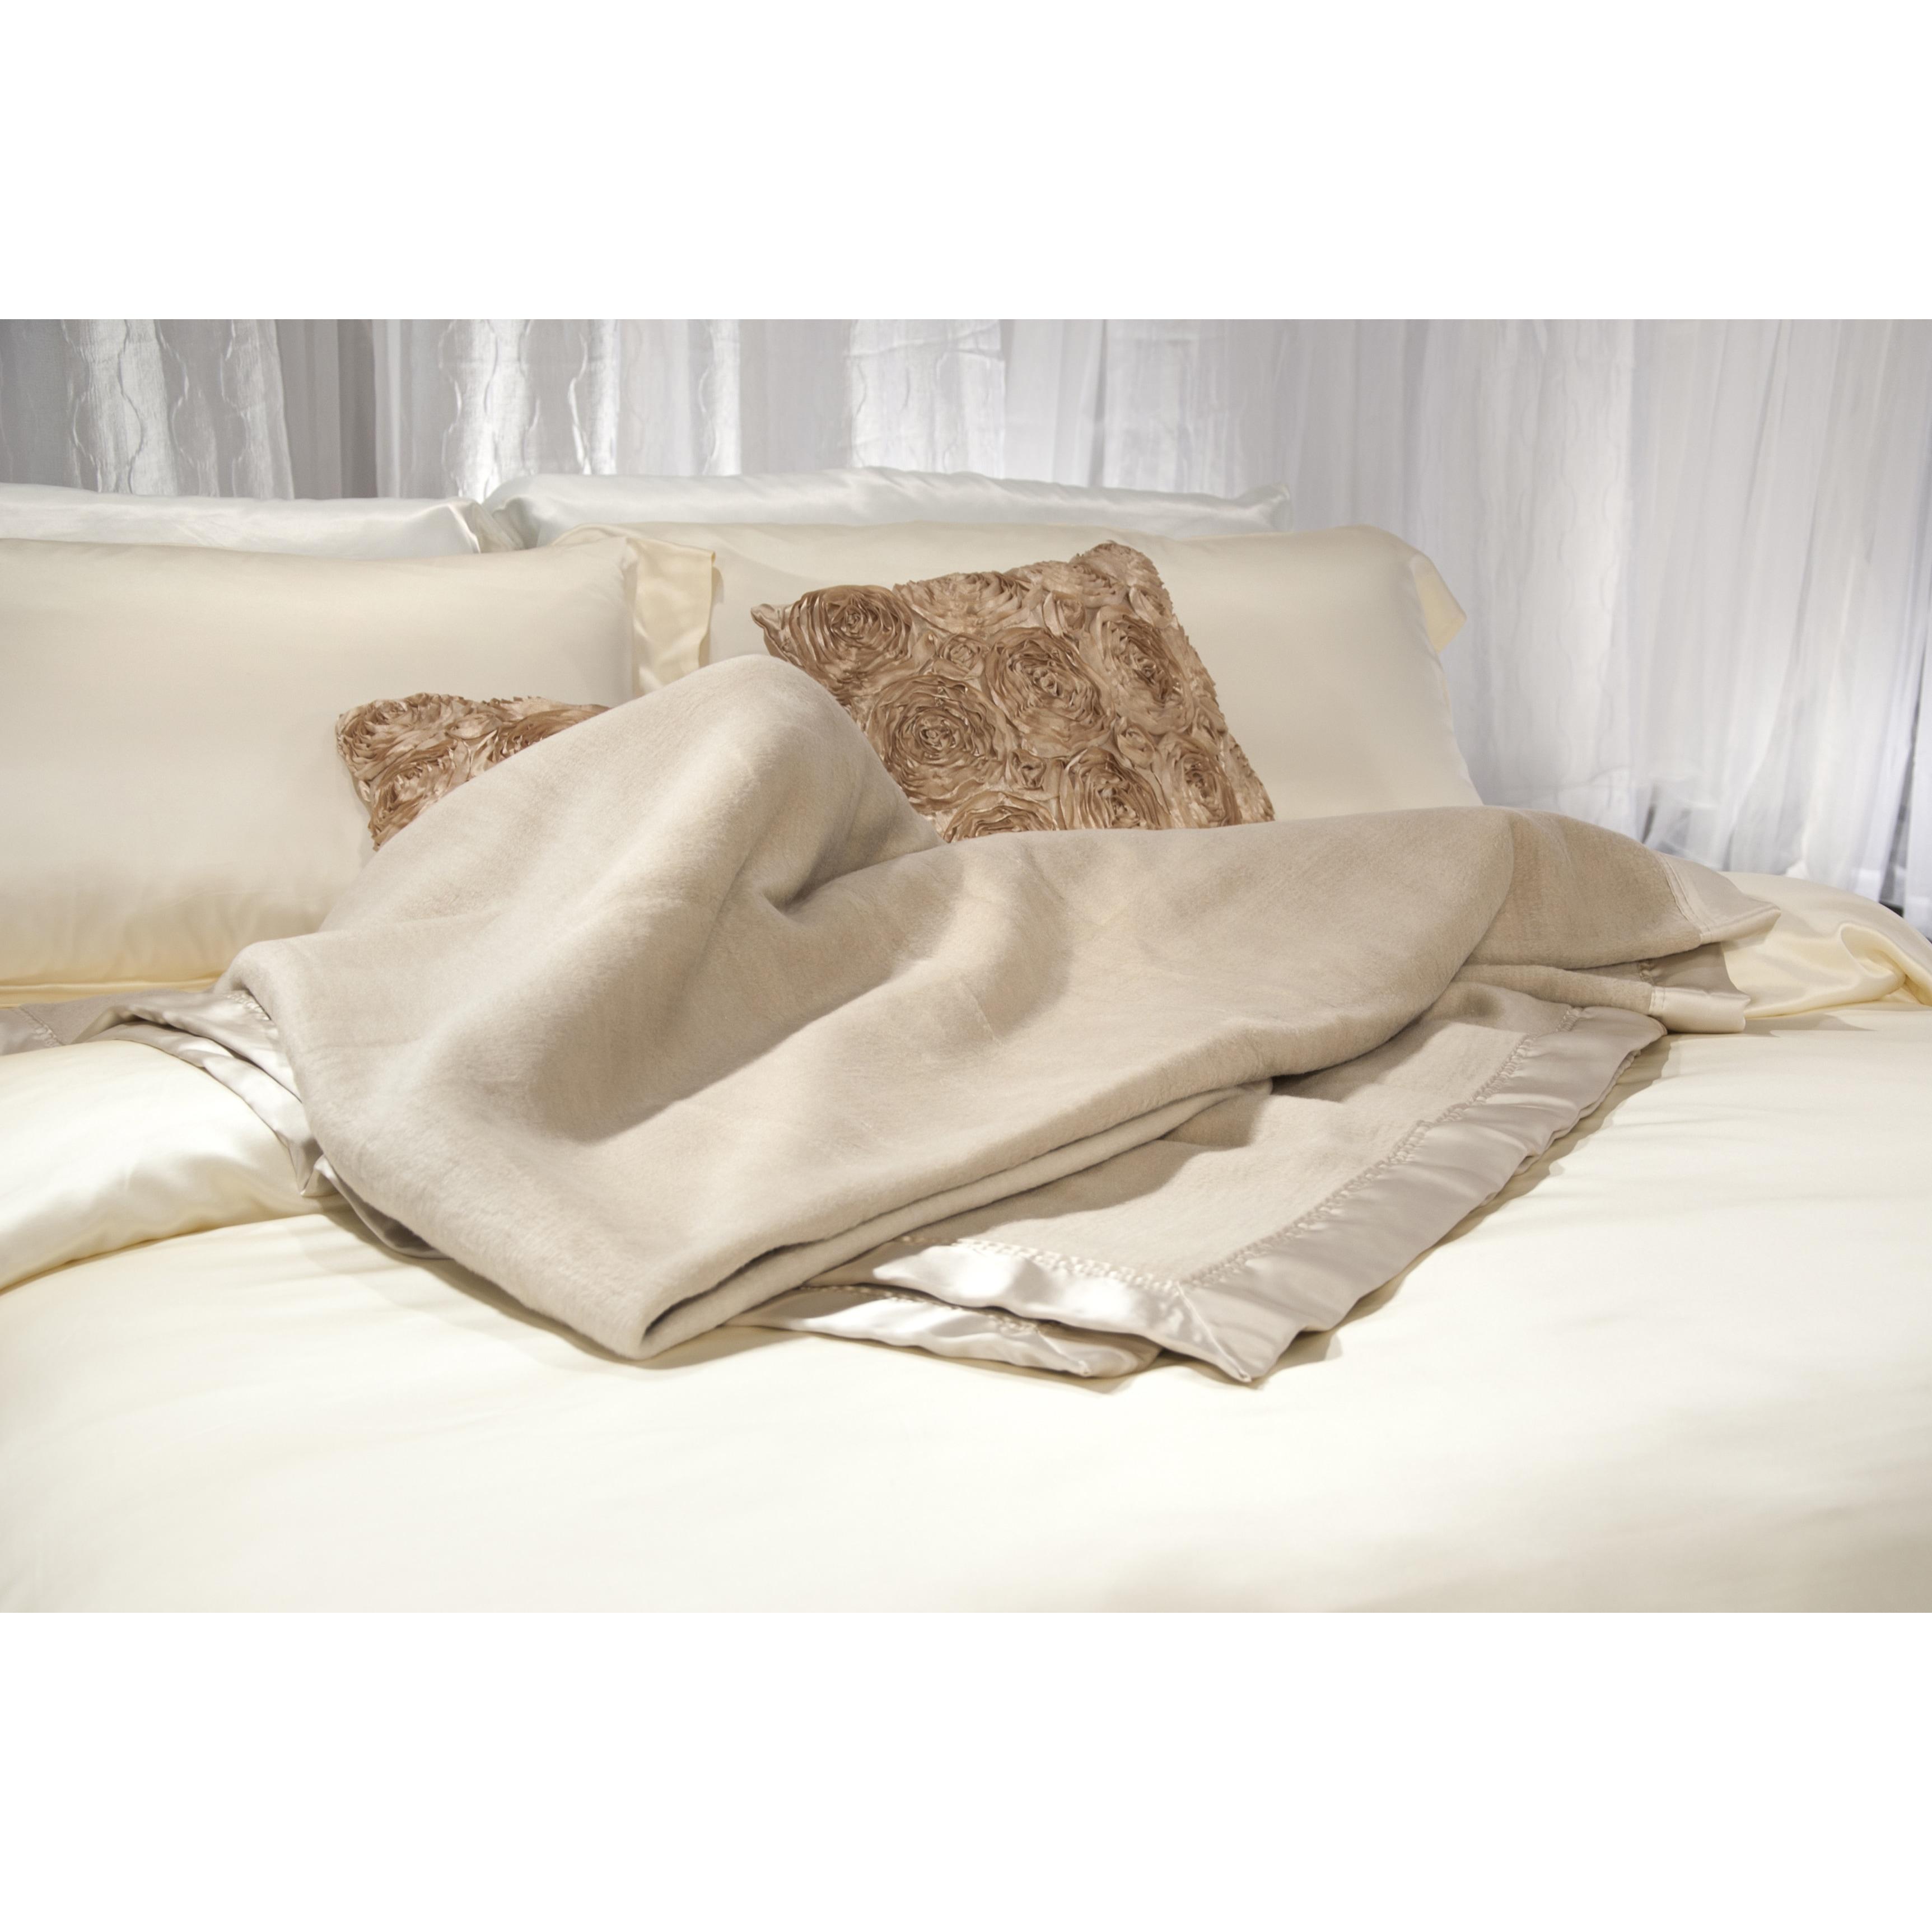 pure mulberry bedding a comforter silk cover duvet